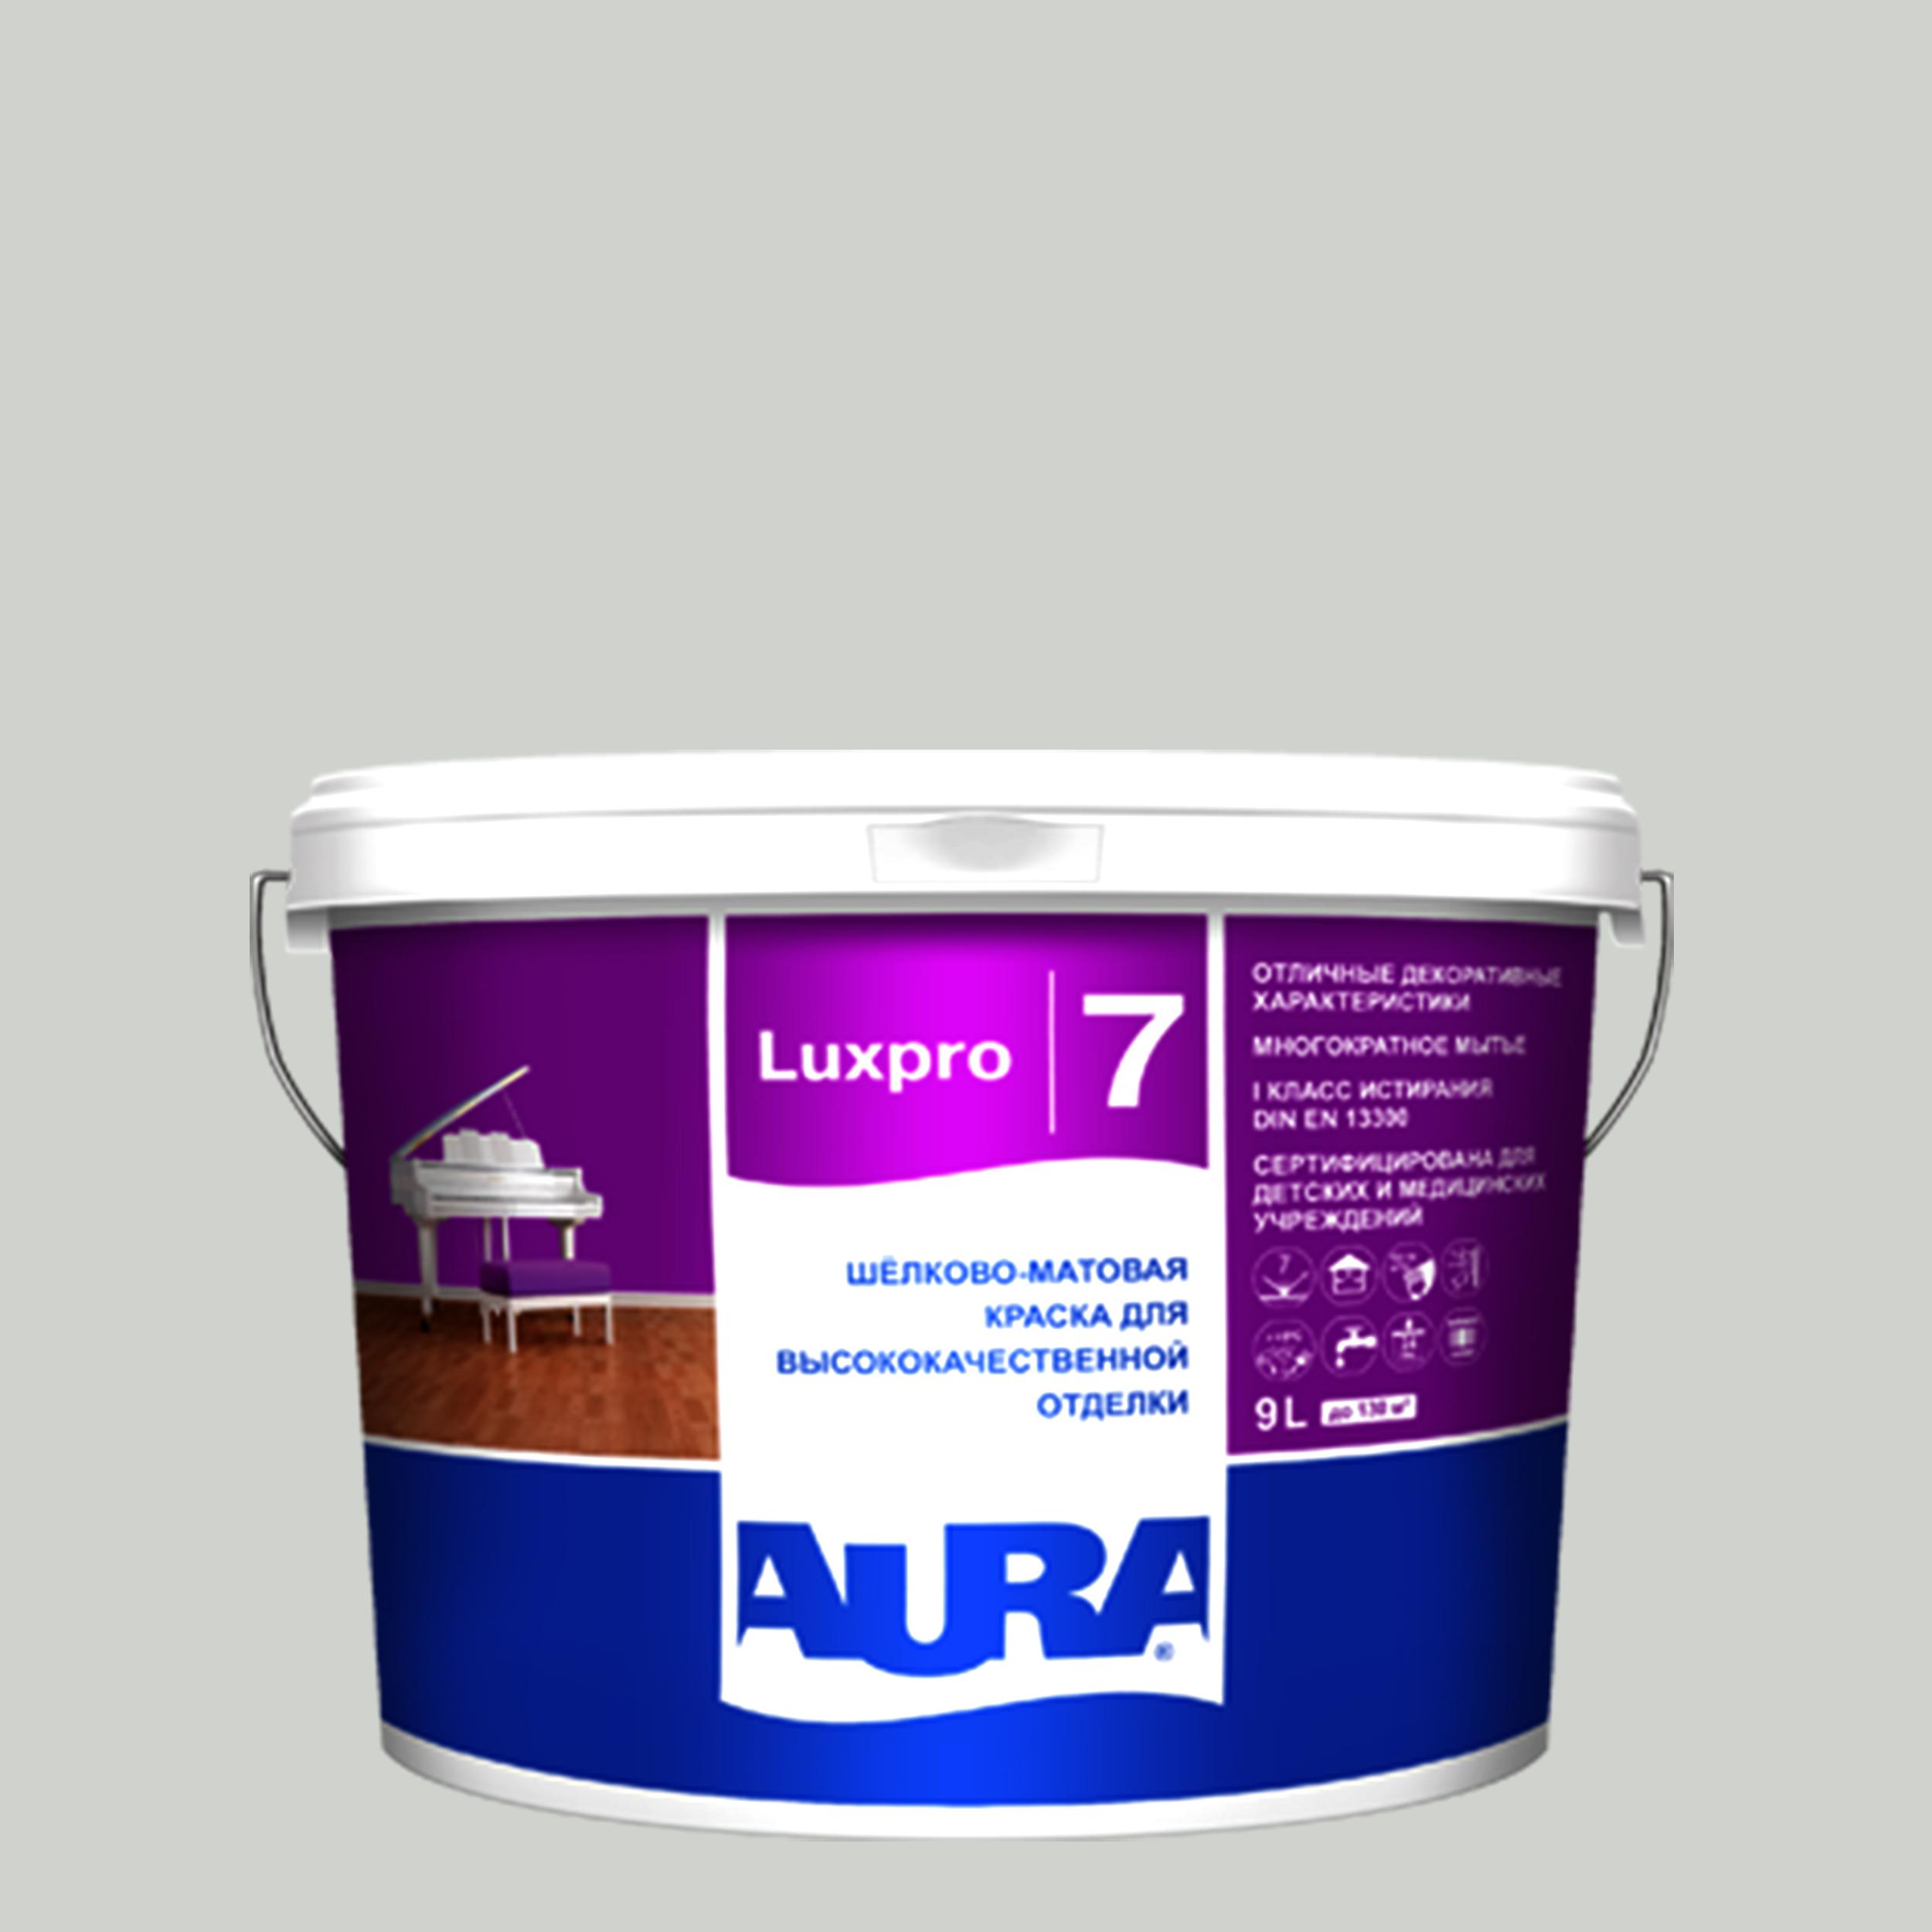 Фото 5 - Краска интерьерная, Aura LuxPRO 7, RAL 3028, 11 кг.